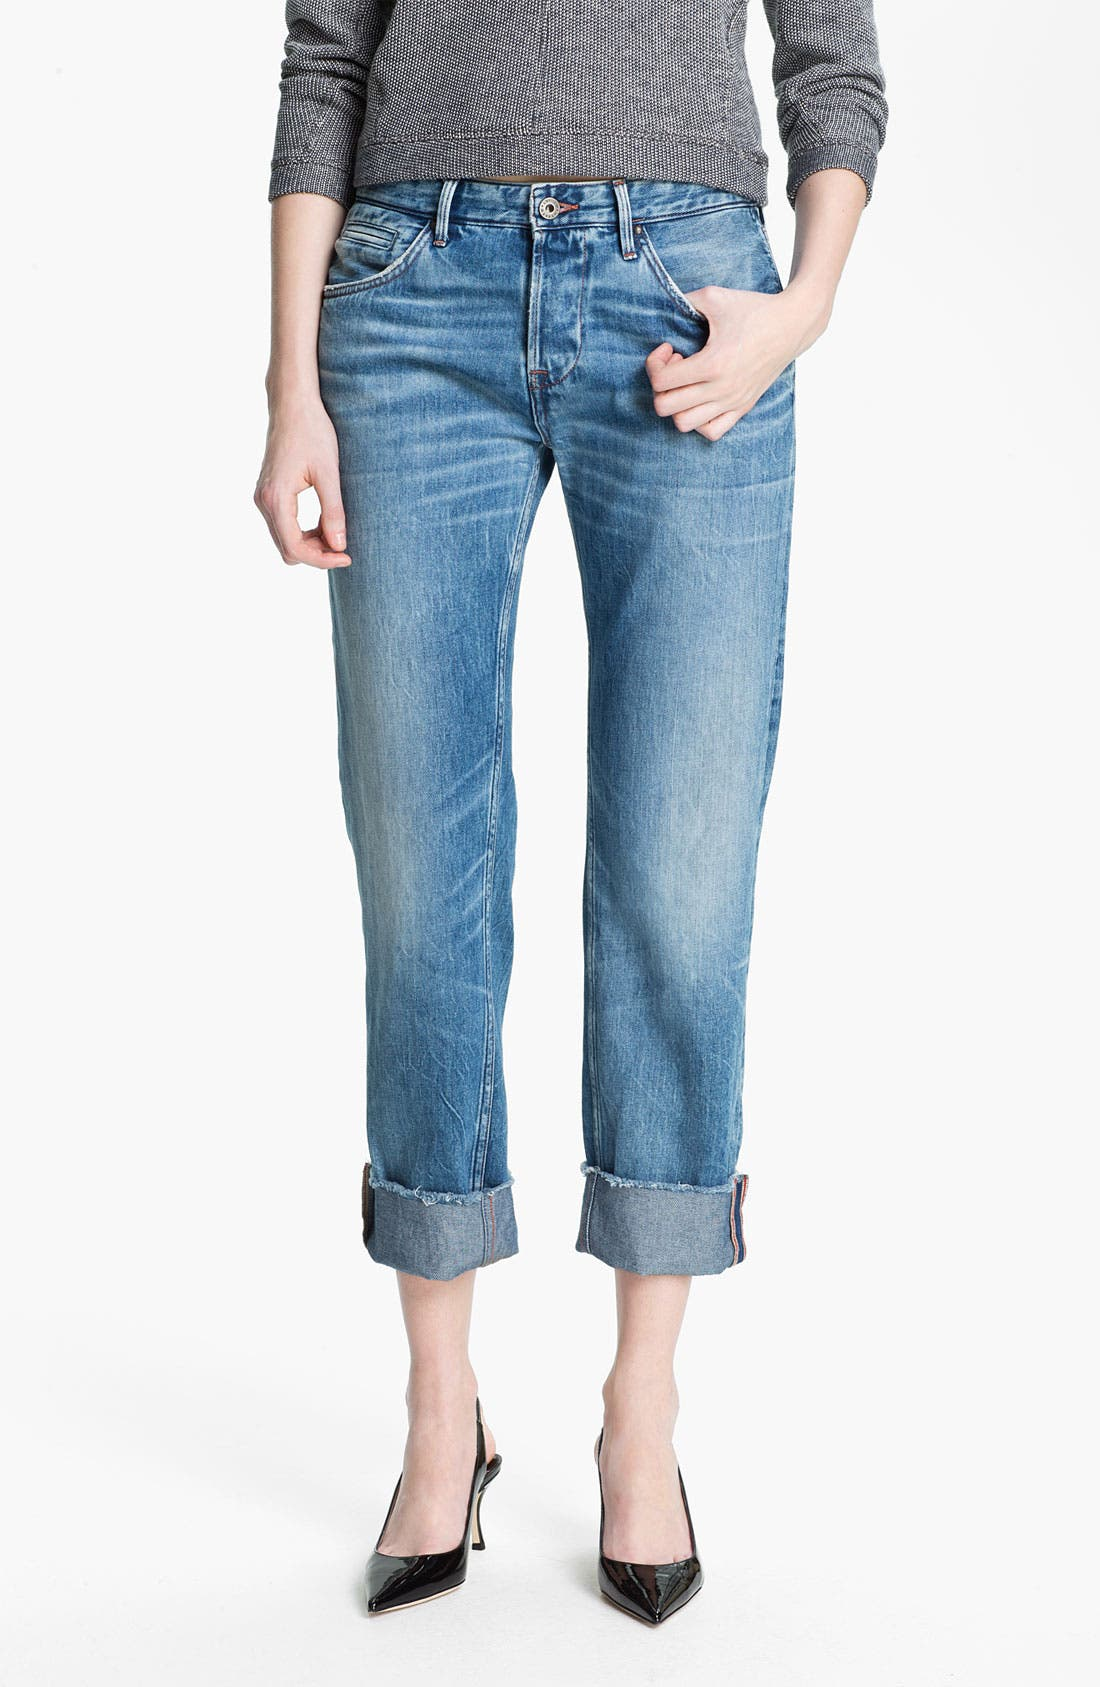 Alternate Image 1 Selected - Twenty8Twelve 'Jonny' Boyfriend Jeans